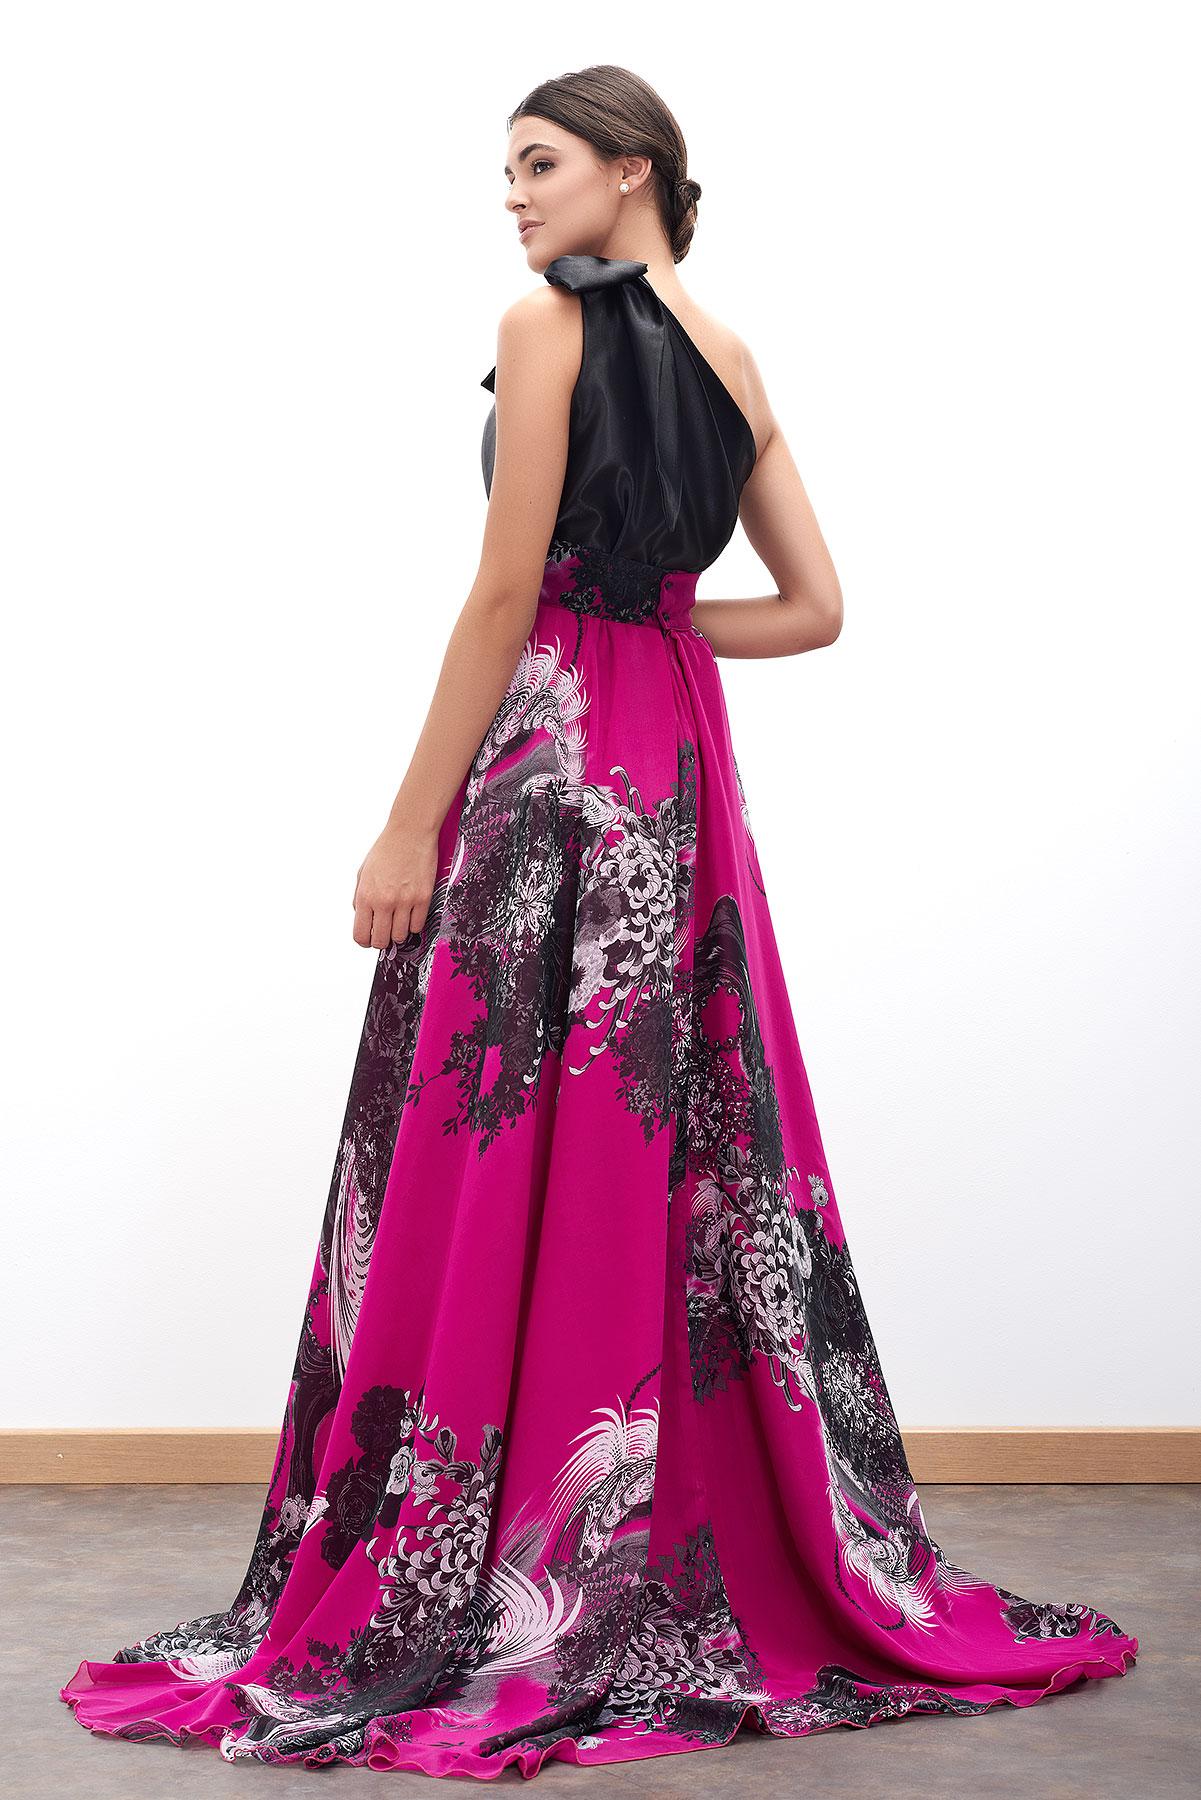 falda de fiesta larga fucsia para ceremonias e invitadas de fiesta diseñada por Fatima Angulo